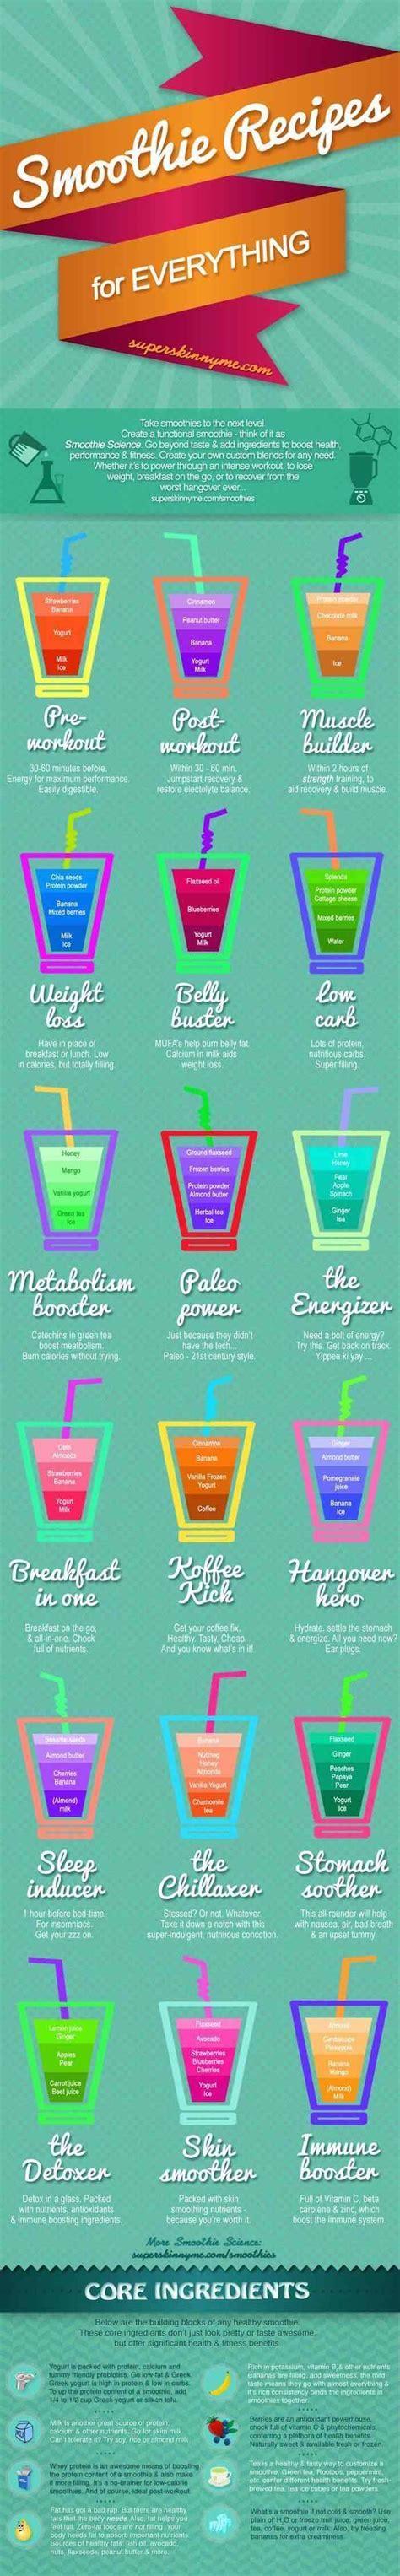 25  best ideas about Diet plans on Pinterest   Food plan